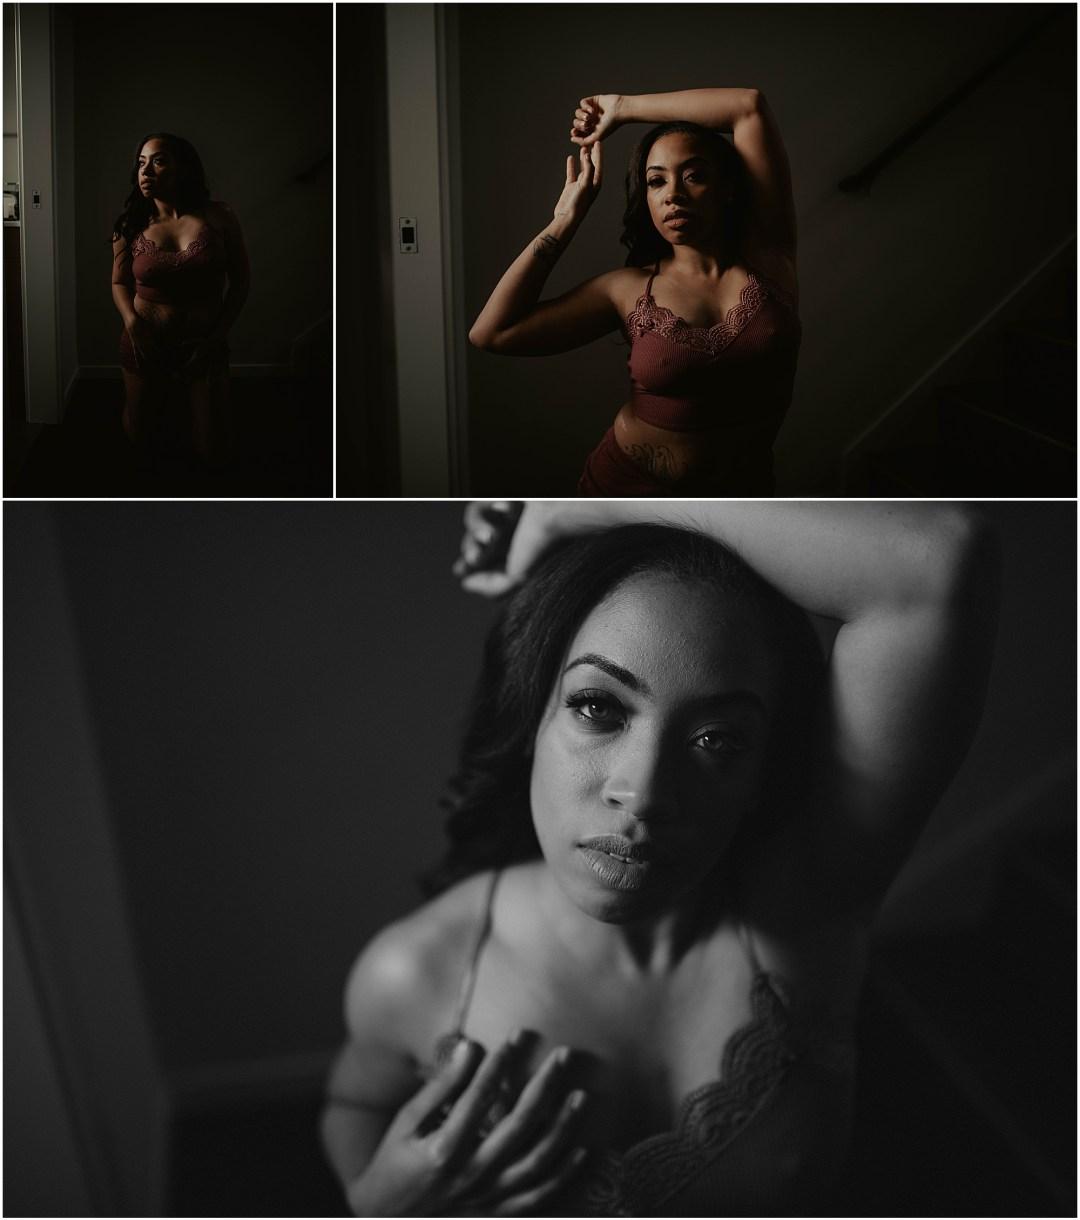 seattle, seattle-boudoir, seattle-boudoir-photographer, mom-boudoir, boudoir-photos, capitol-hill-seattle, boudoir-photography, boudoir-inspiration, female-empowerment, capitol-hill, tattoo-boudoir, Empowered, boudoir-project,